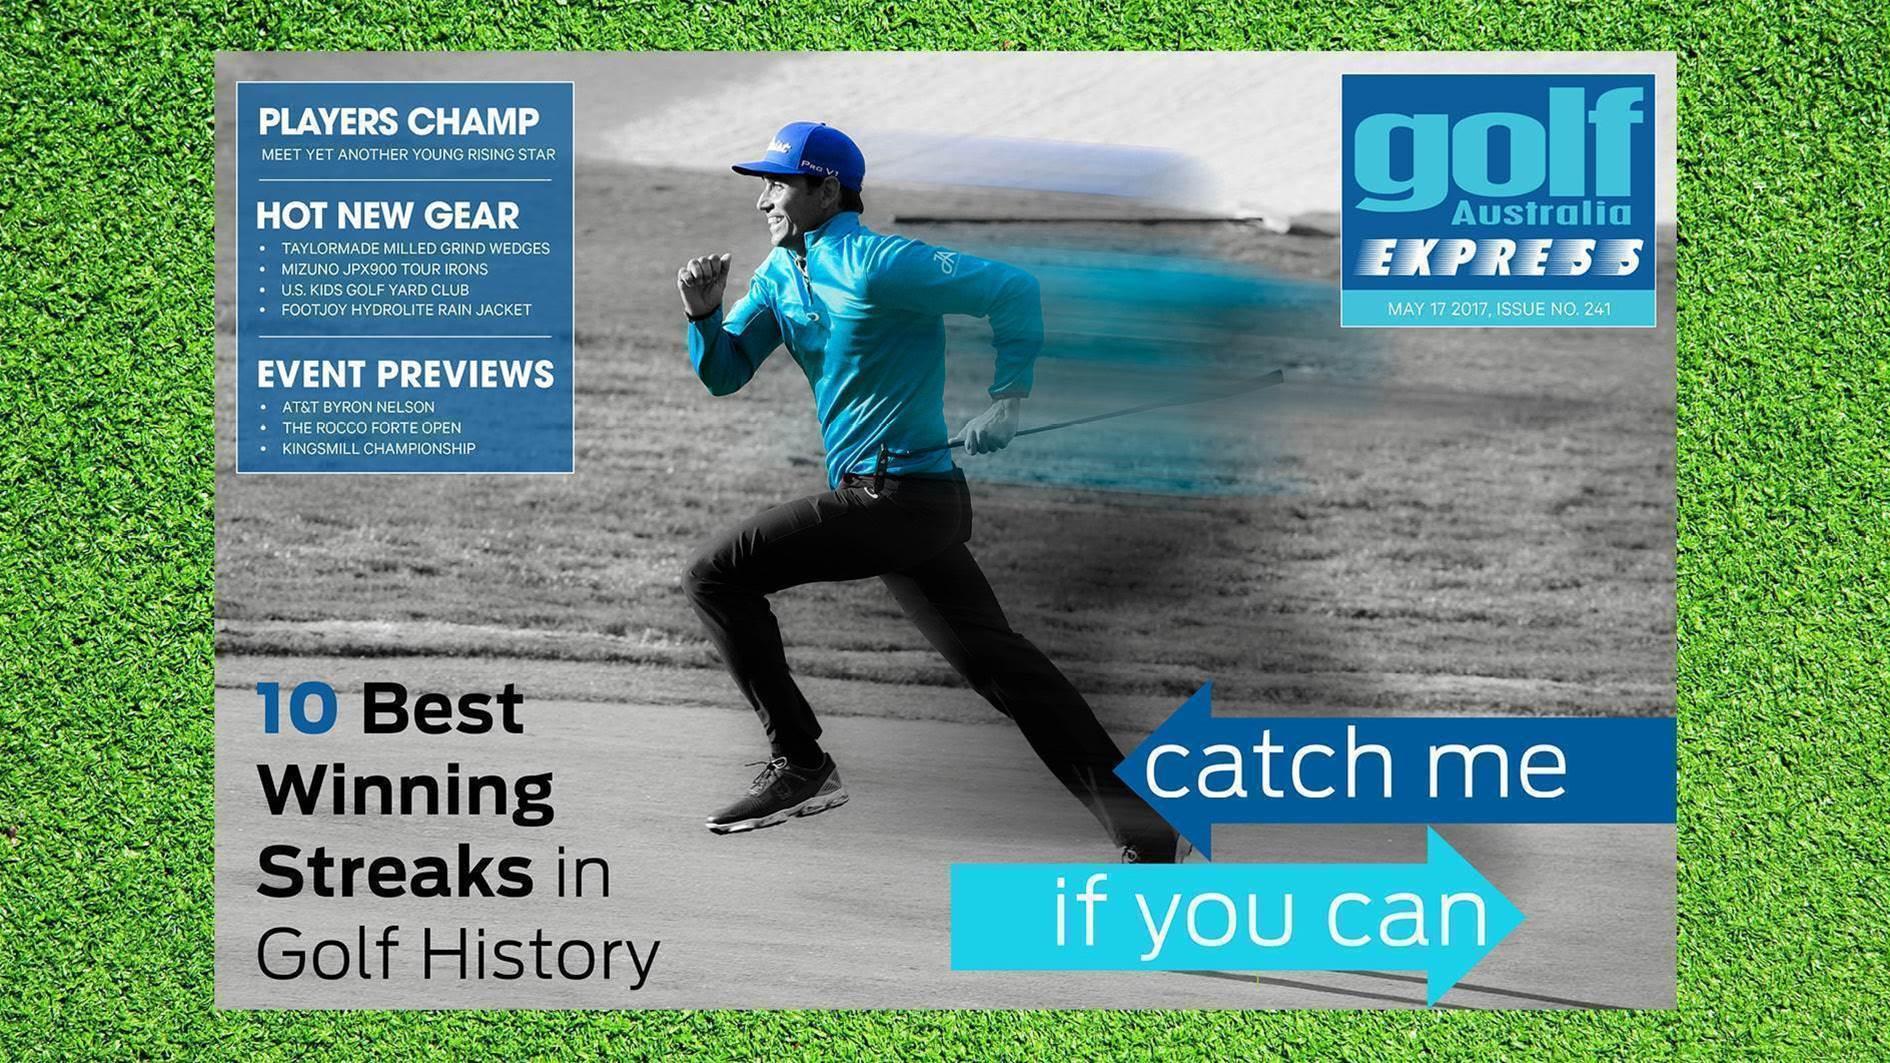 GA Express #241: Golf's greatest winning streaks